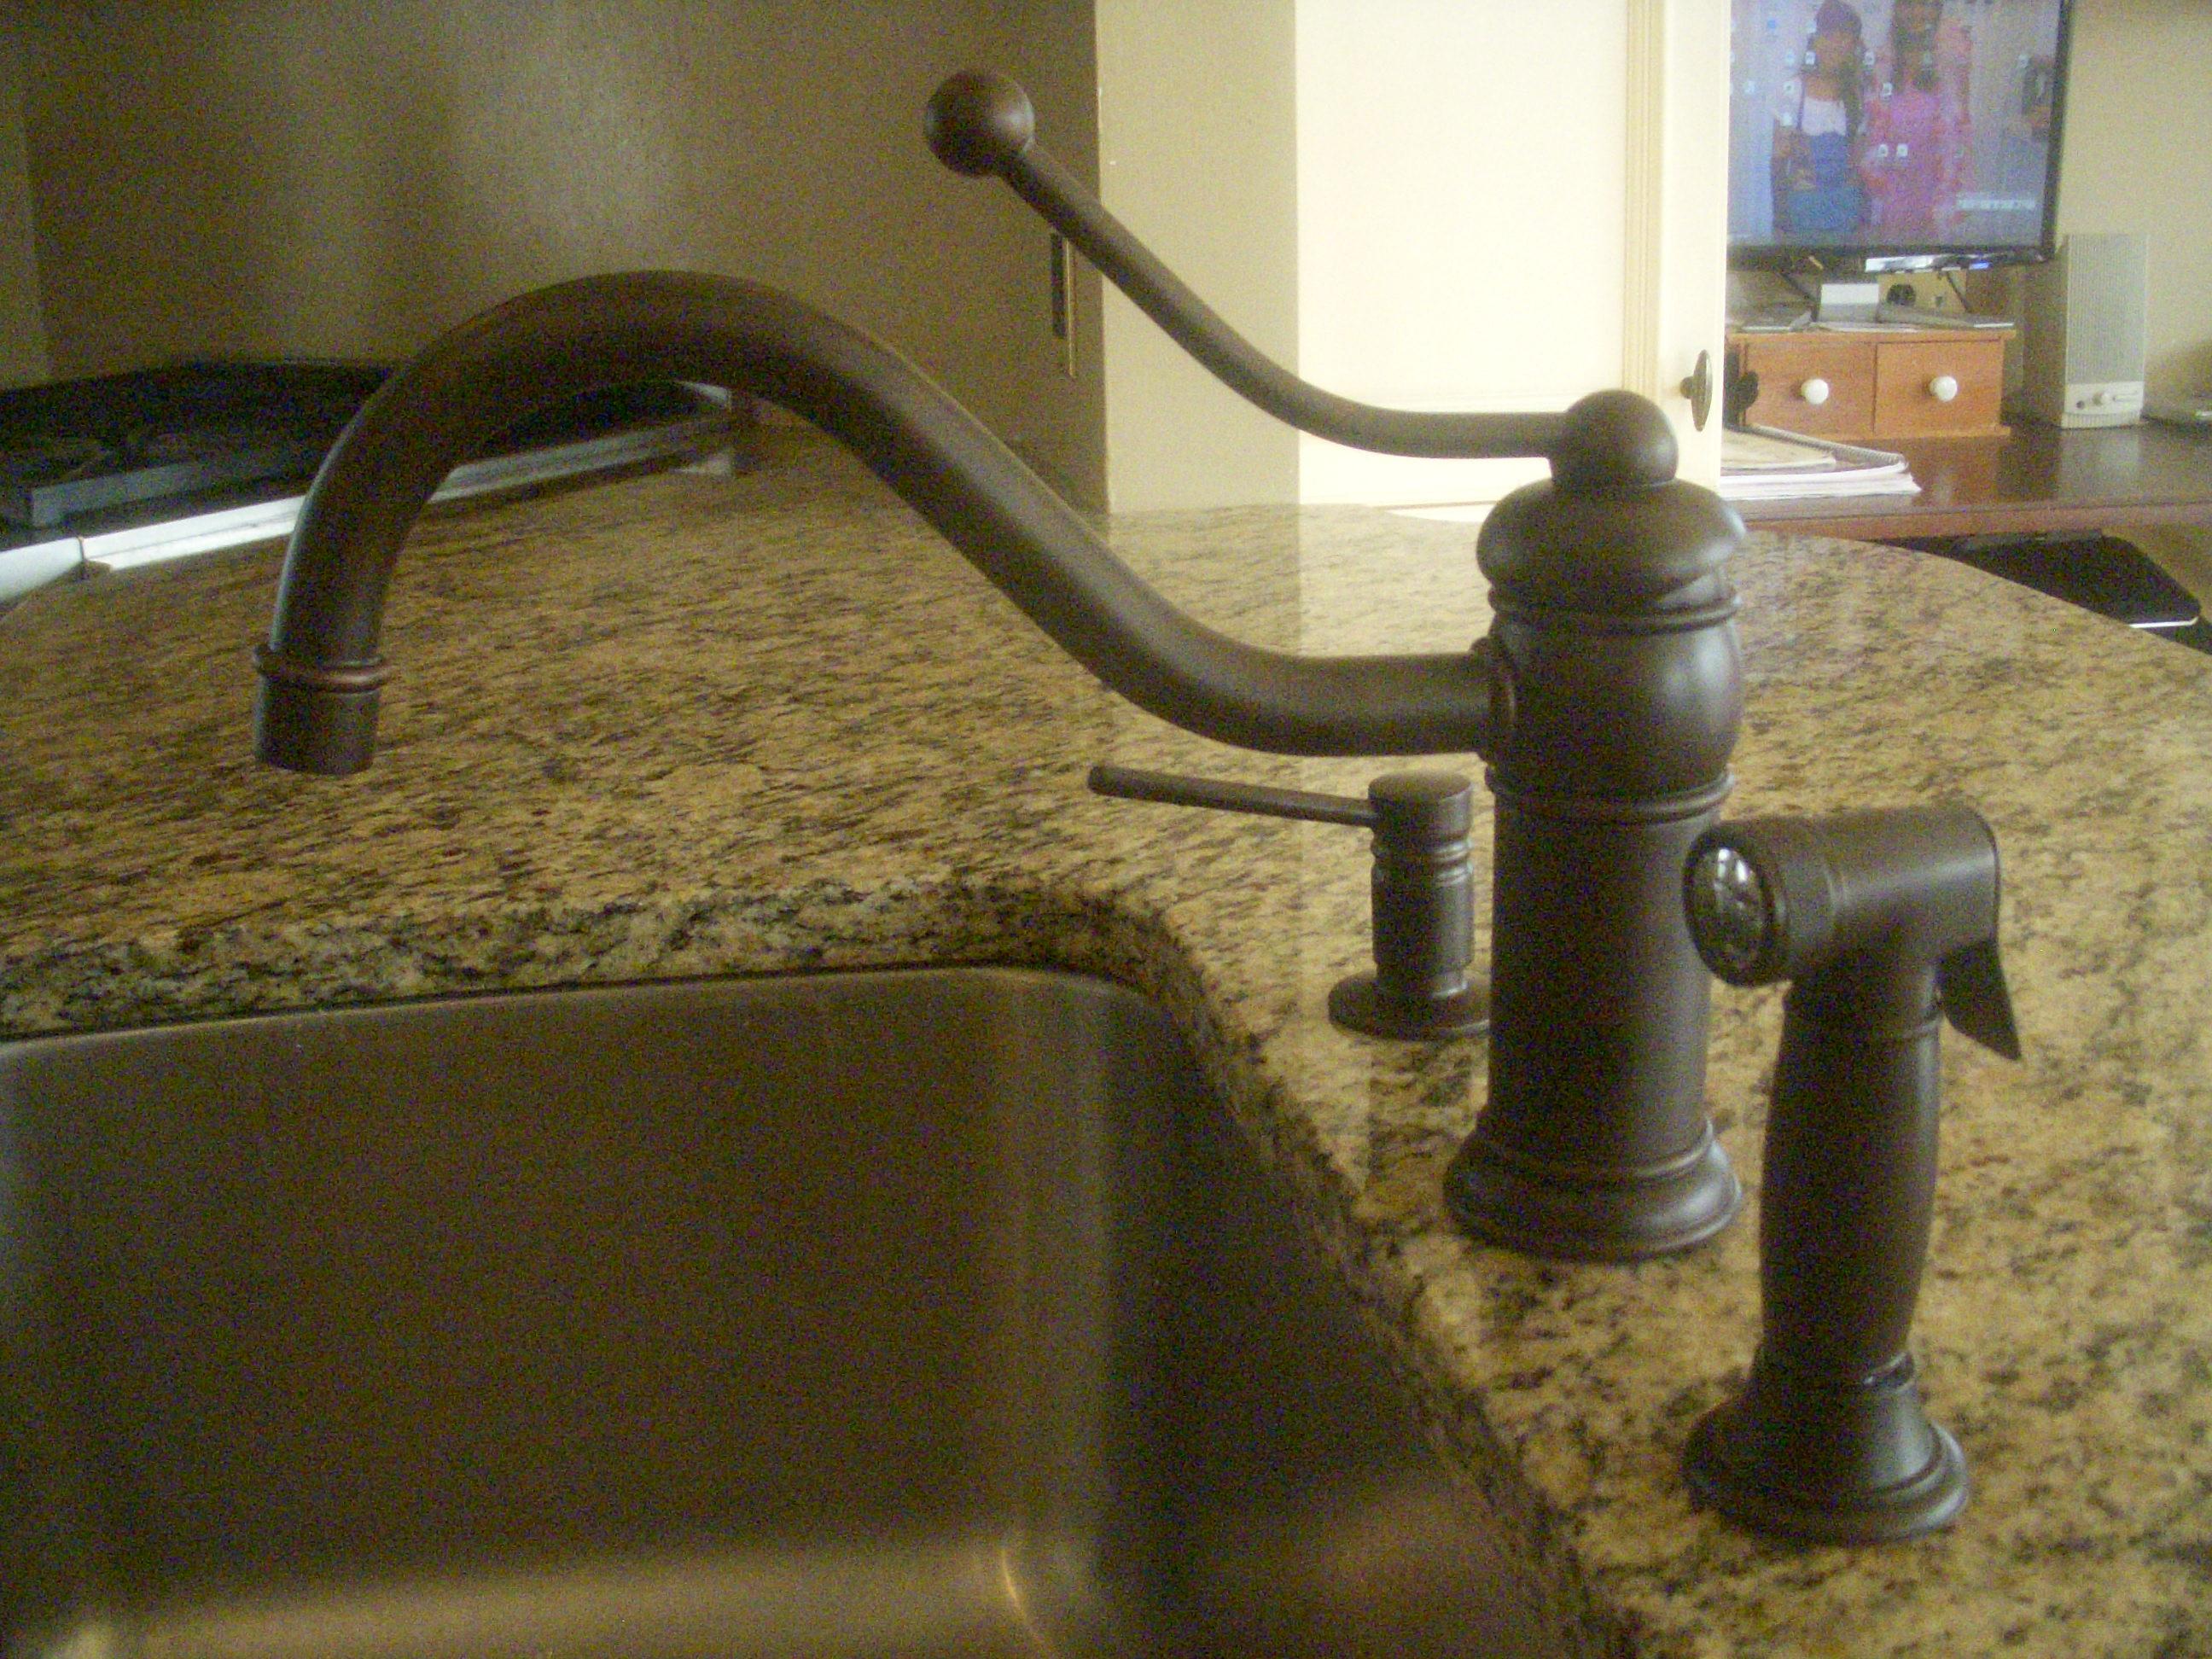 Delta Victorian Kitchen Faucet Oil Rubbed Bronze – Wow Blog